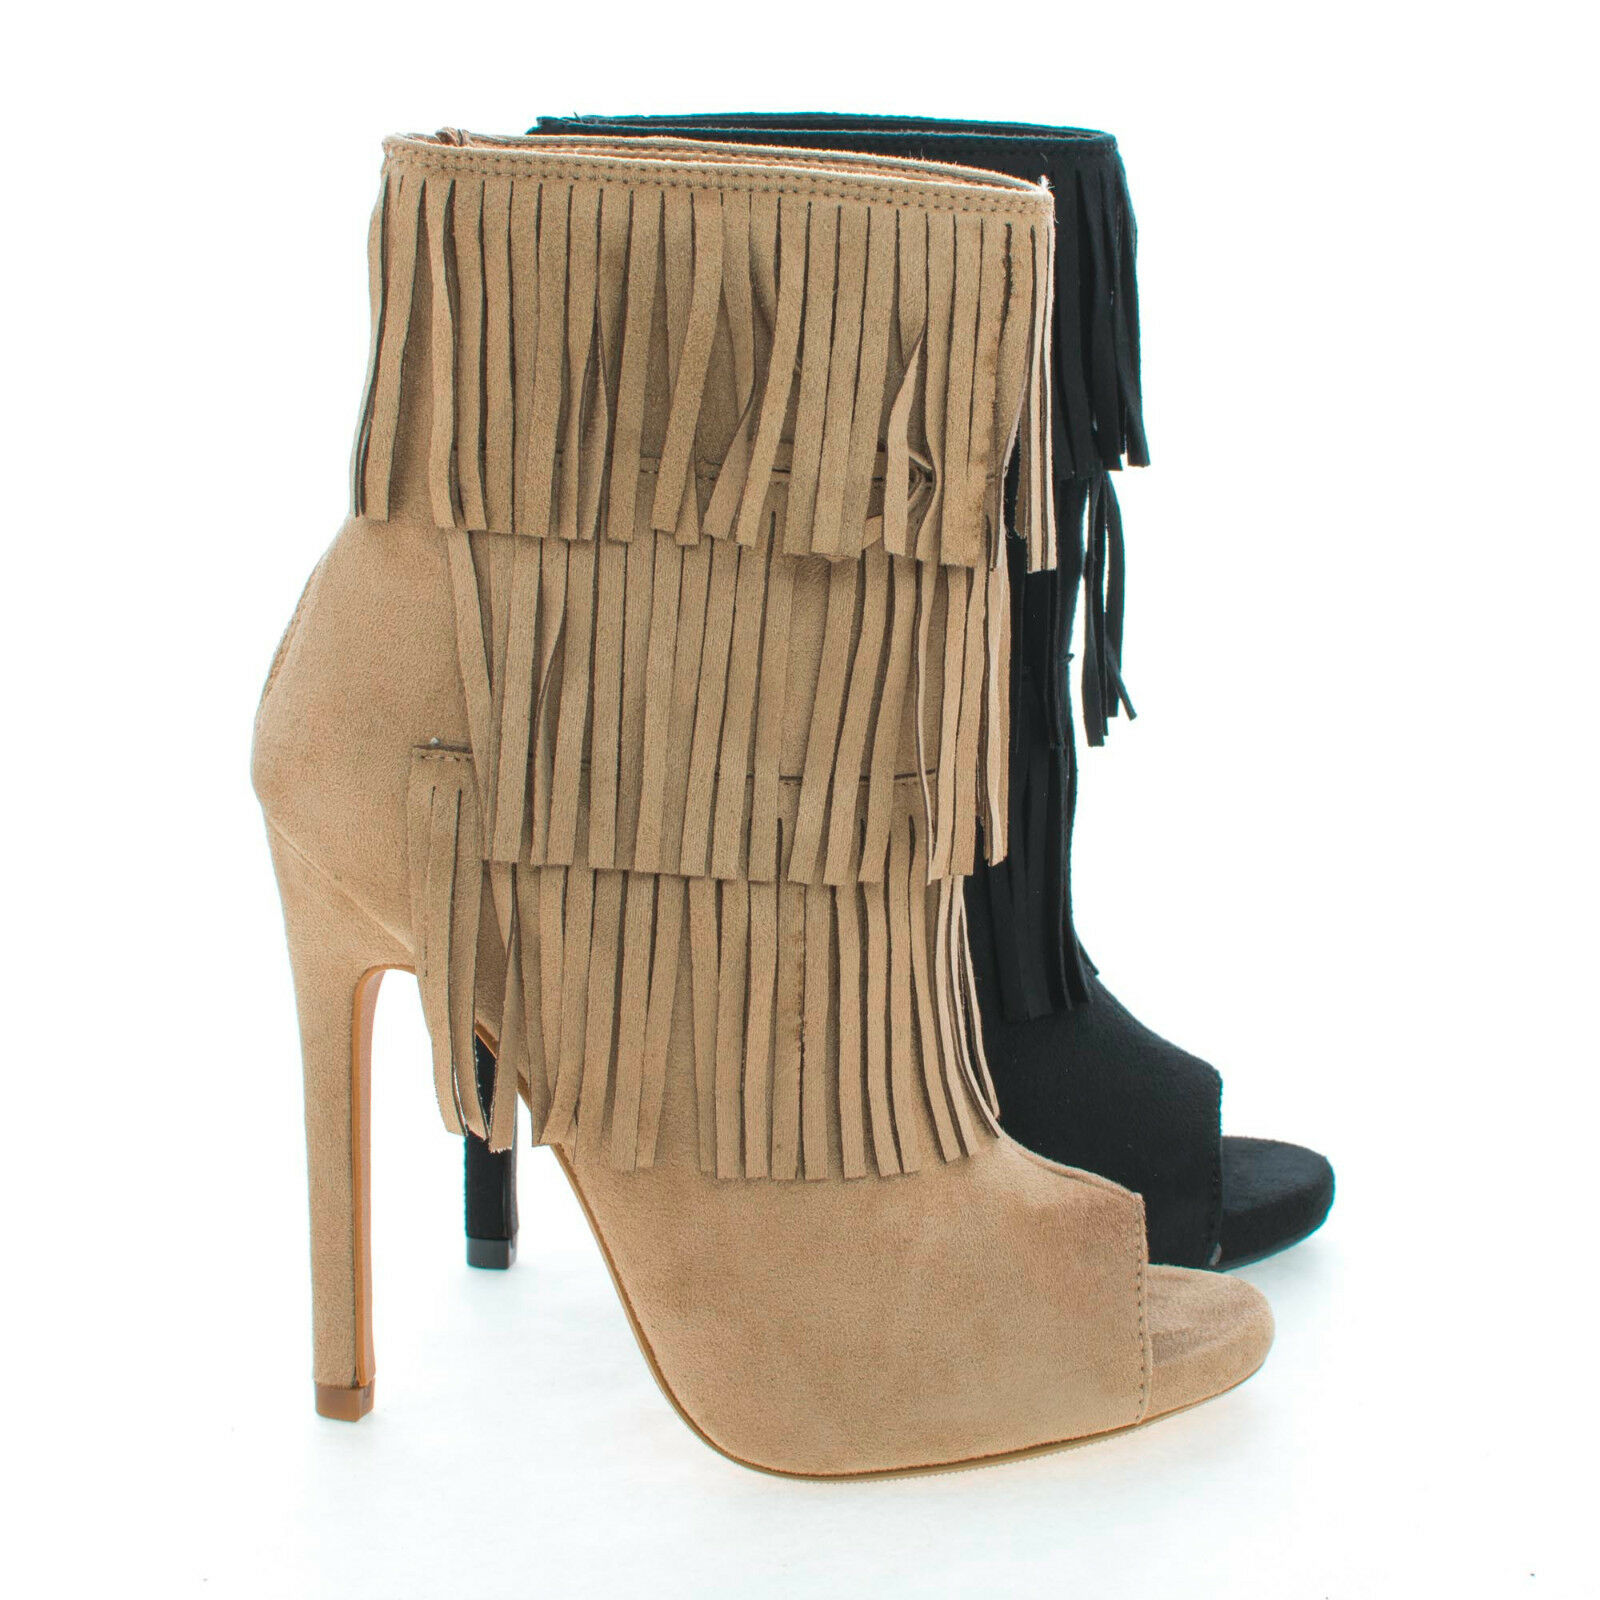 Gain Peep Toe Pleaded Fringe Zip Up Stiletto Heel Ankle Booties